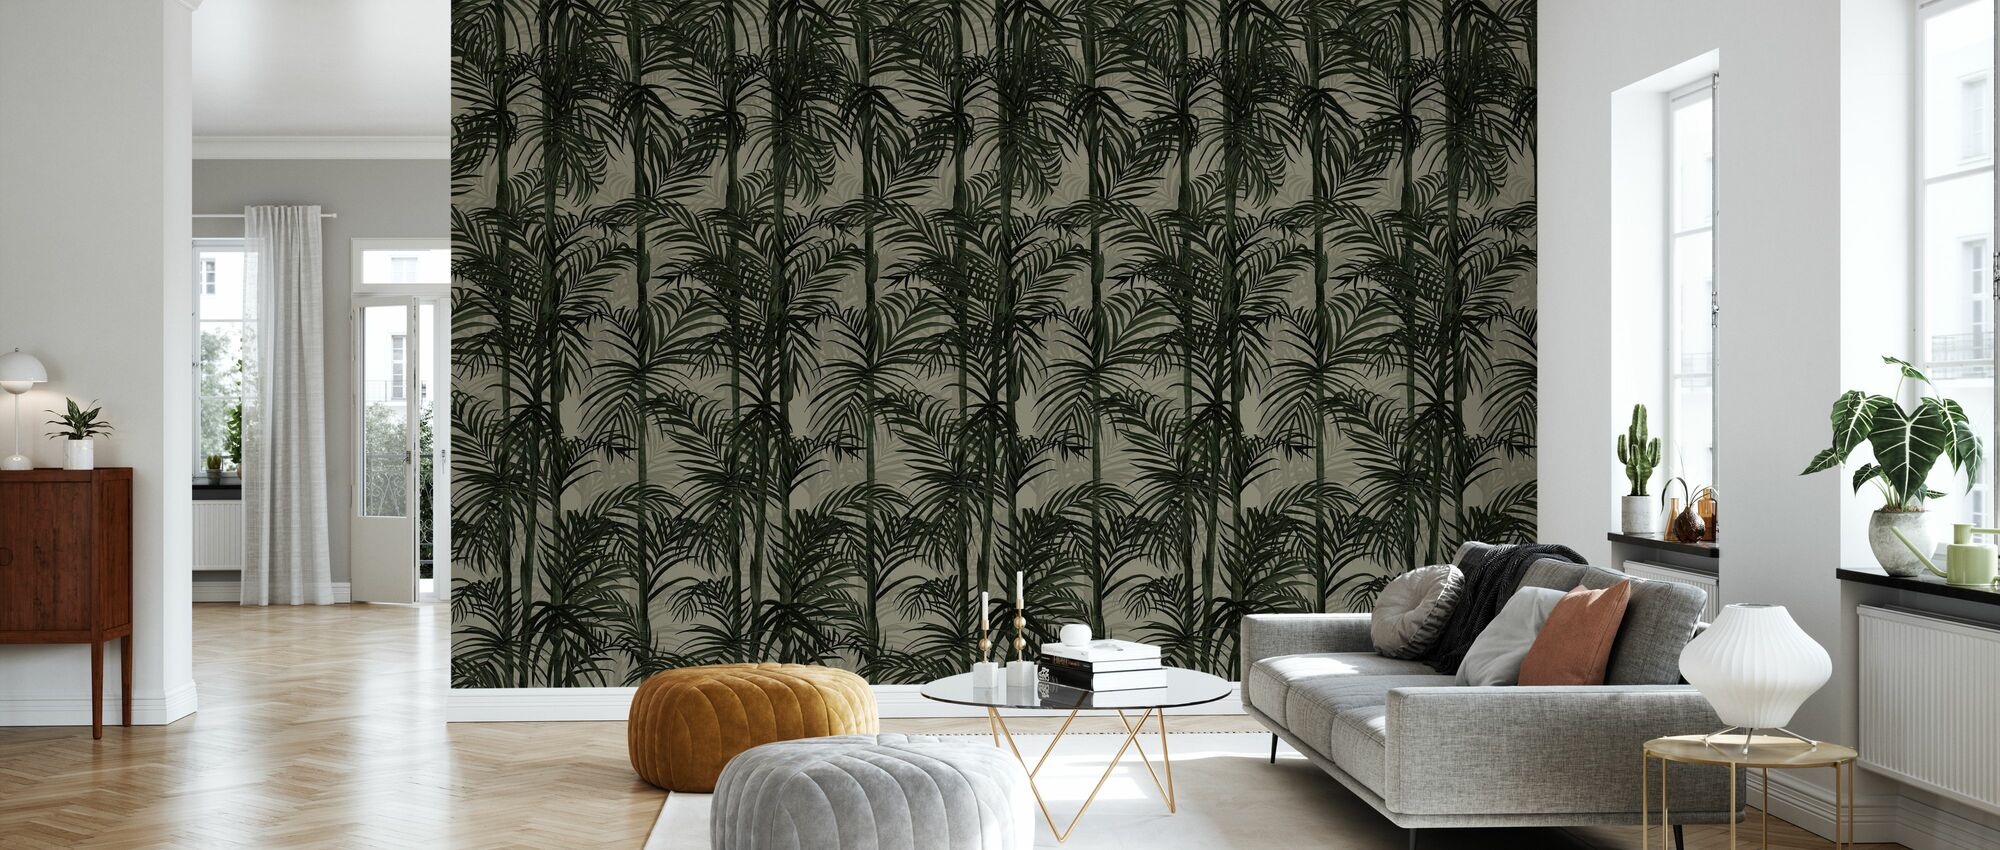 Botany Bamboo - Safari - Wallpaper - Living Room